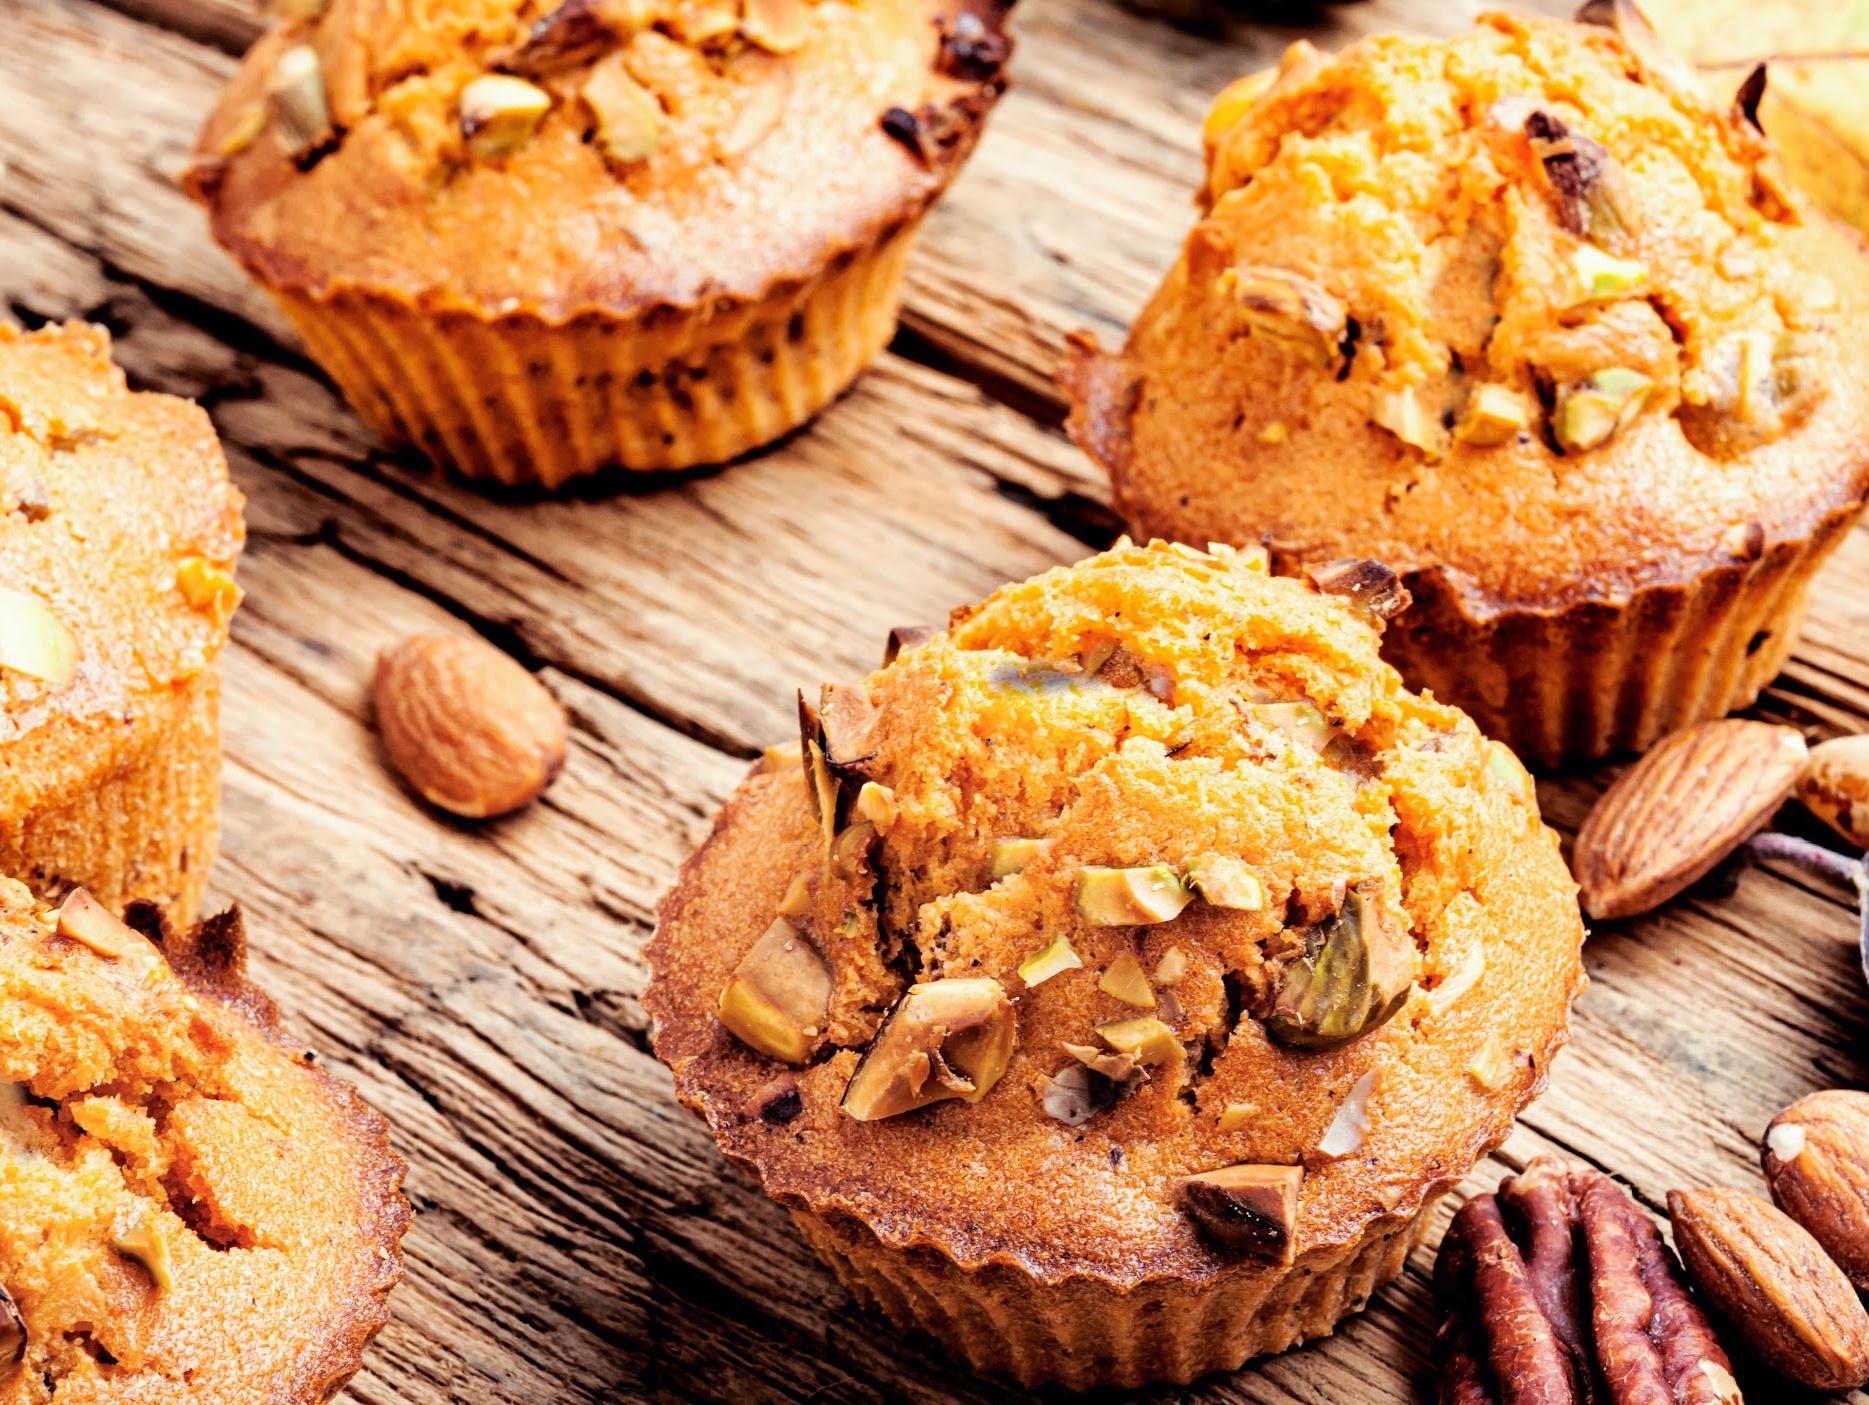 Keto high fiber breakfast muffins on a wood board